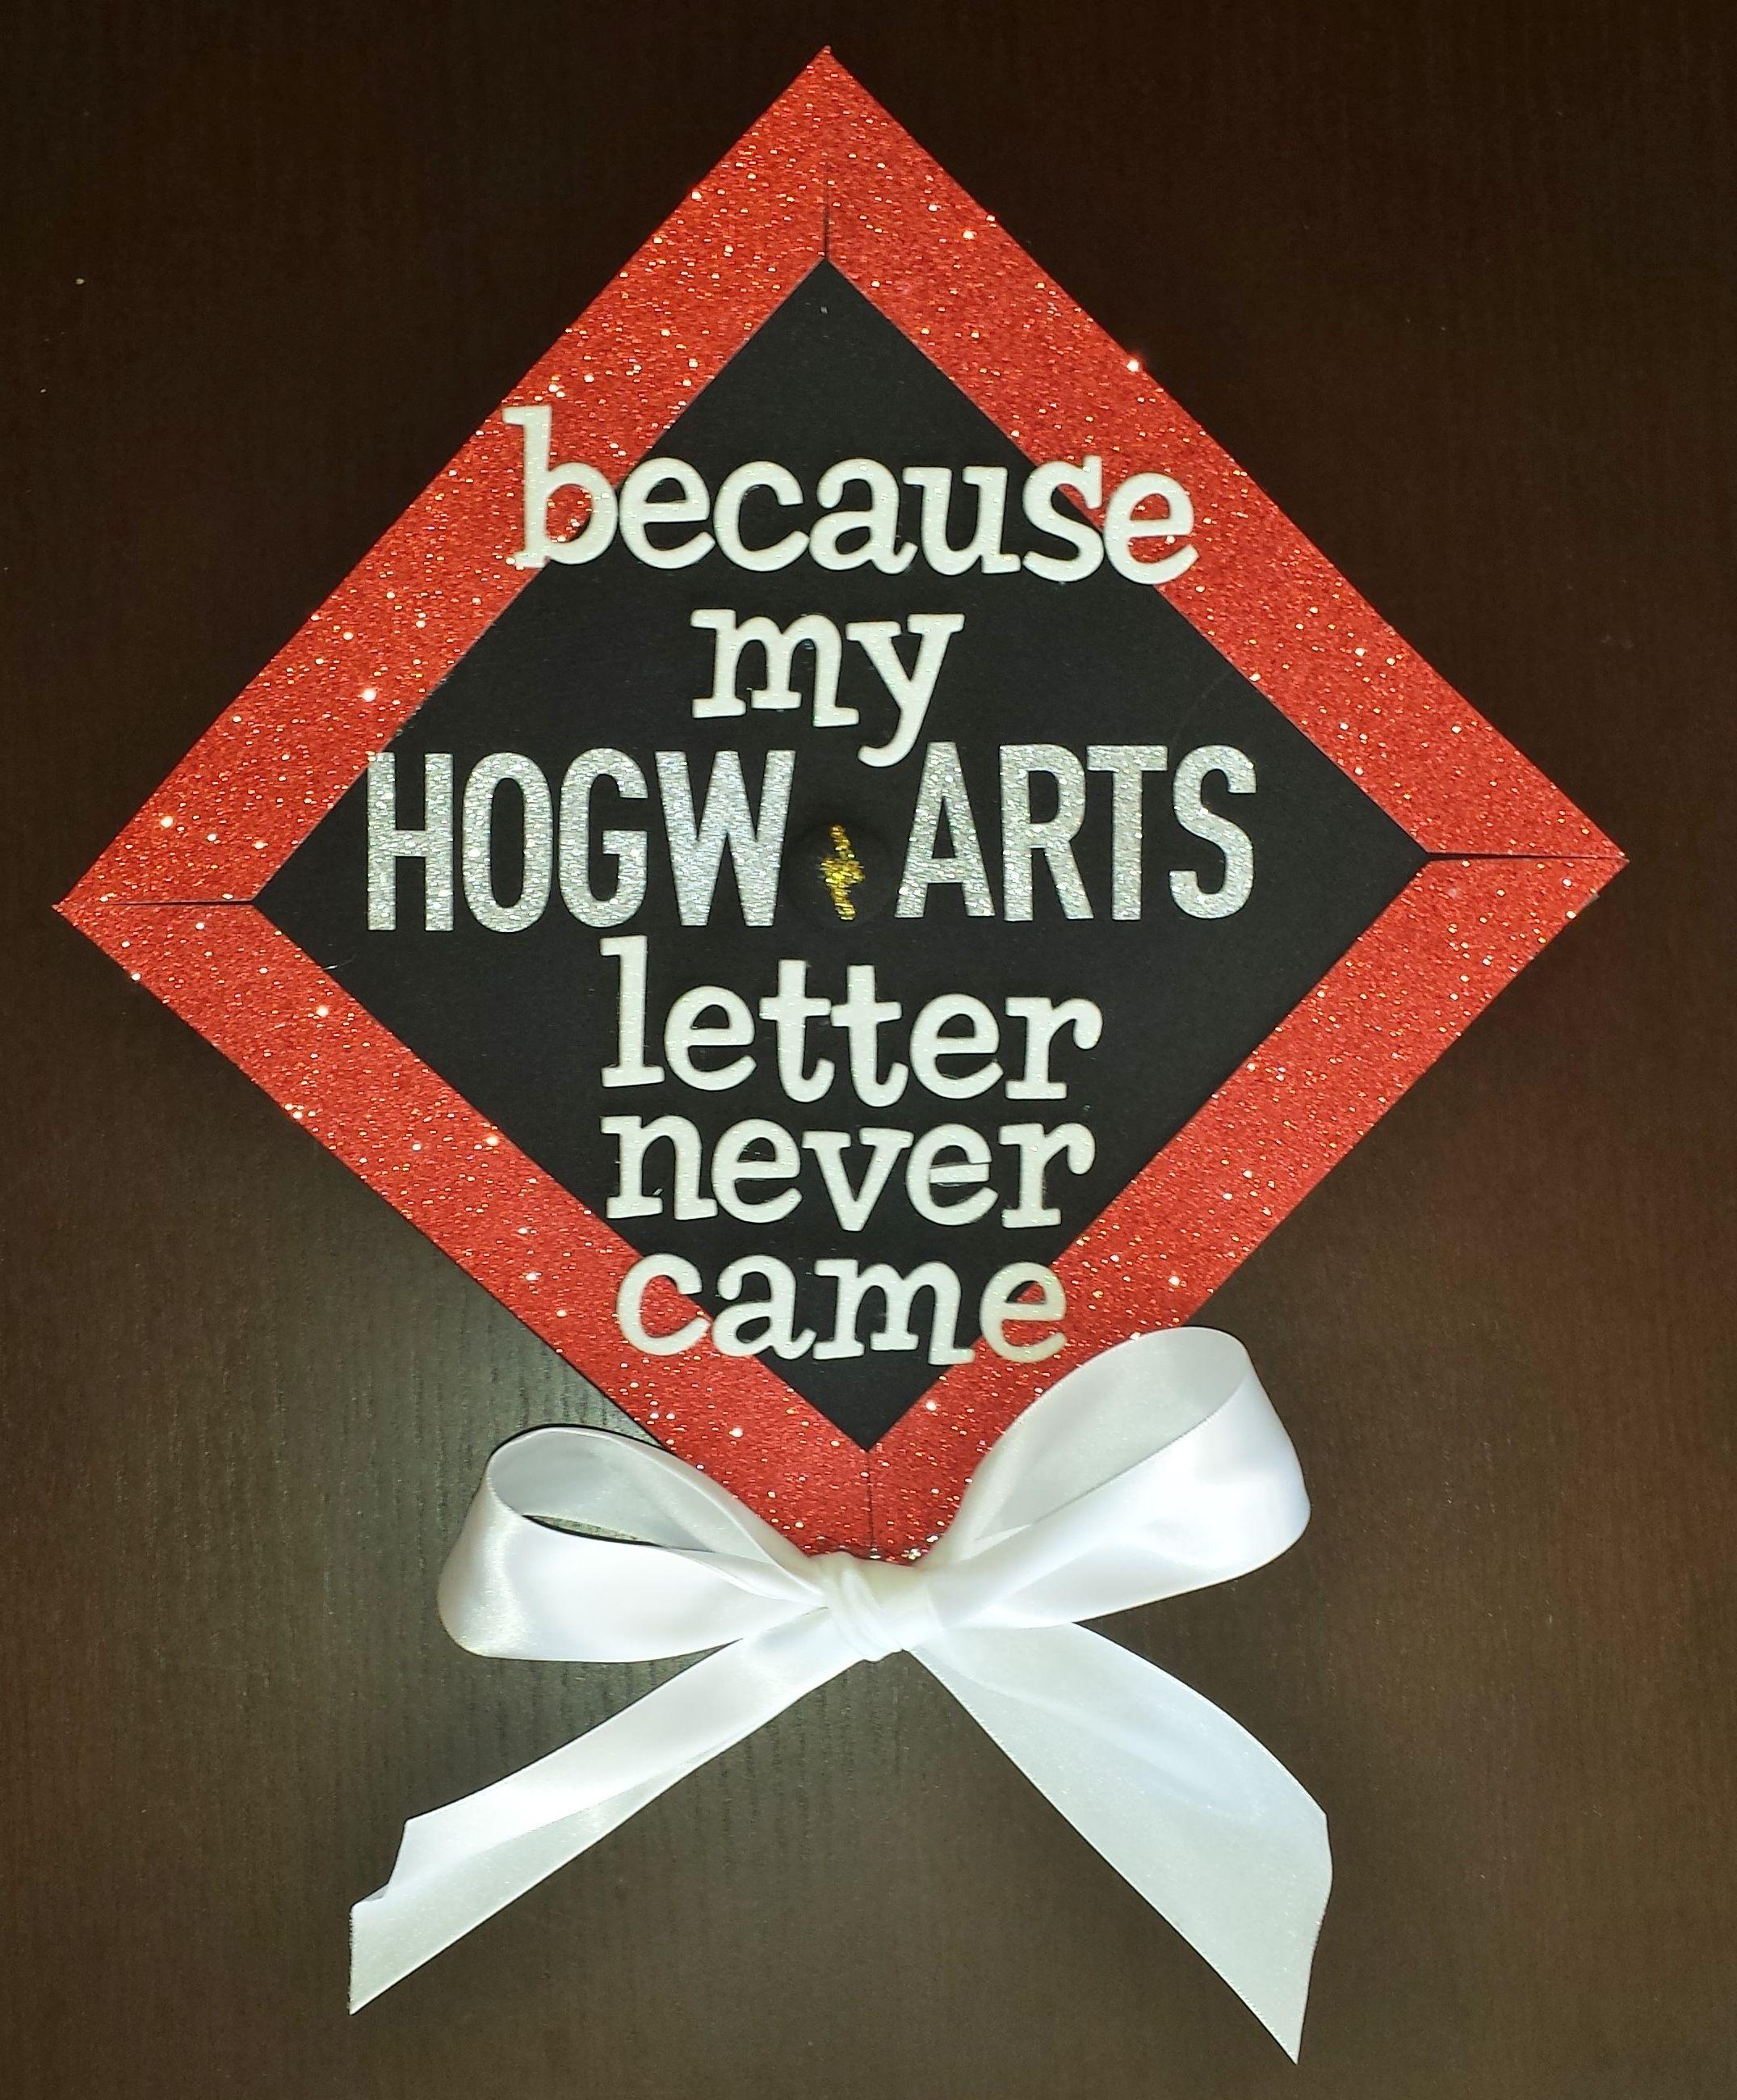 Graduation Cap Decoration Harry Potter Hogwarts Graduation Cap Decoration Graduation Crafts Cap Decorations